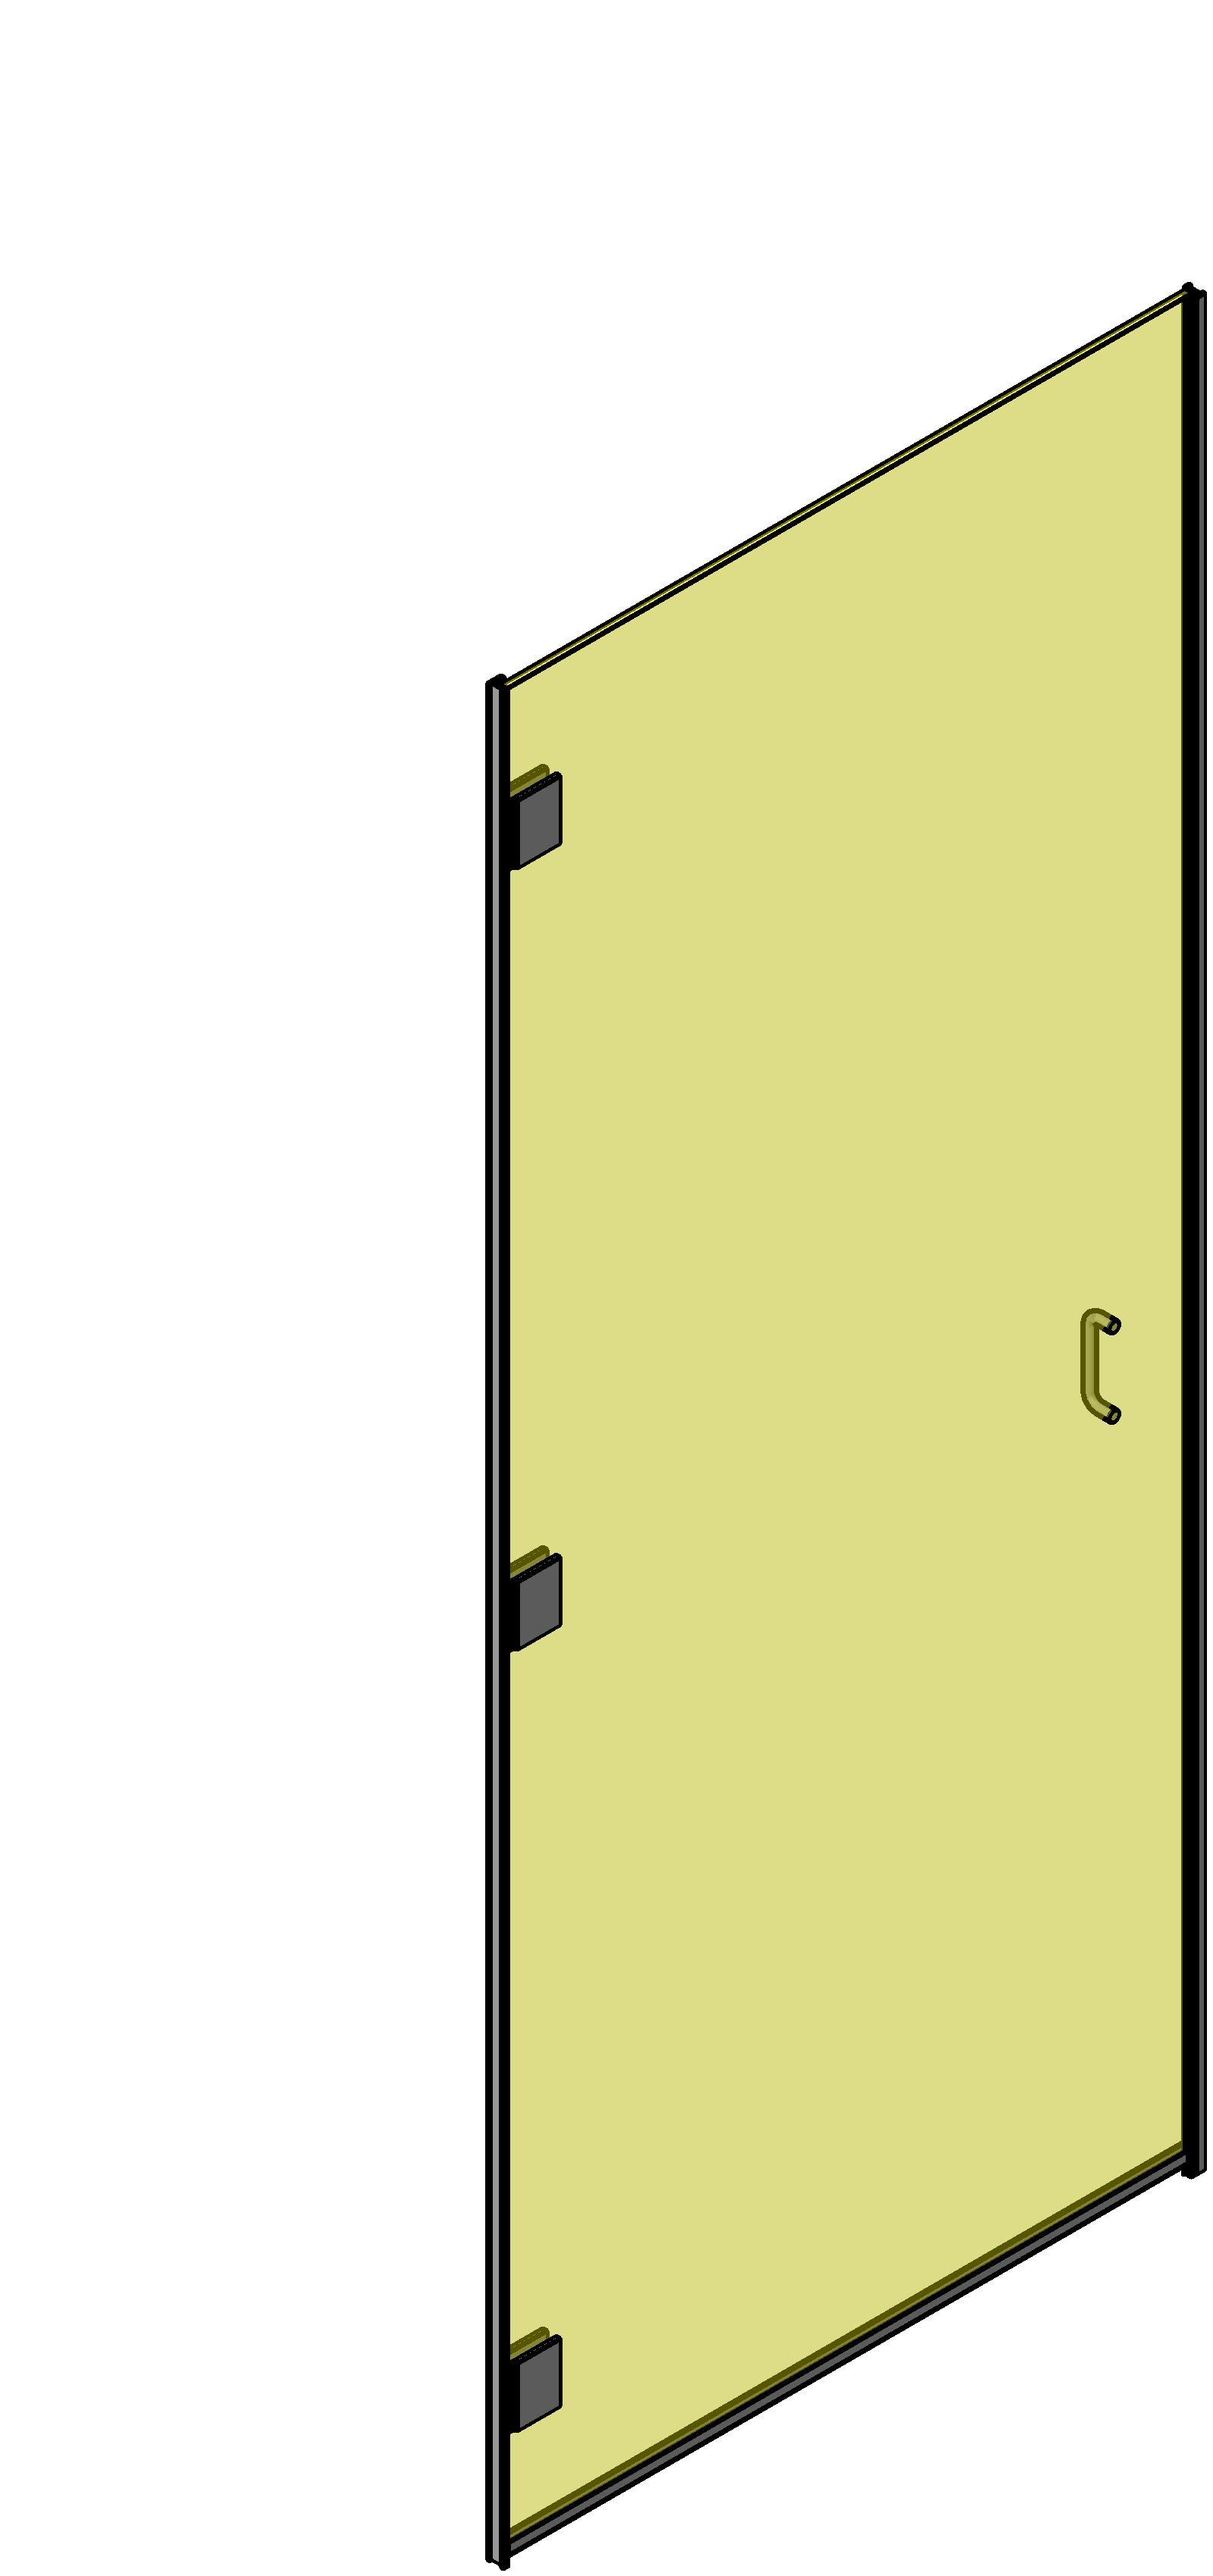 American Shower Door Corp. BIM content  sc 1 st  Arcat & American Shower Door Corp. Shower and Dressing Compartments BIM ...